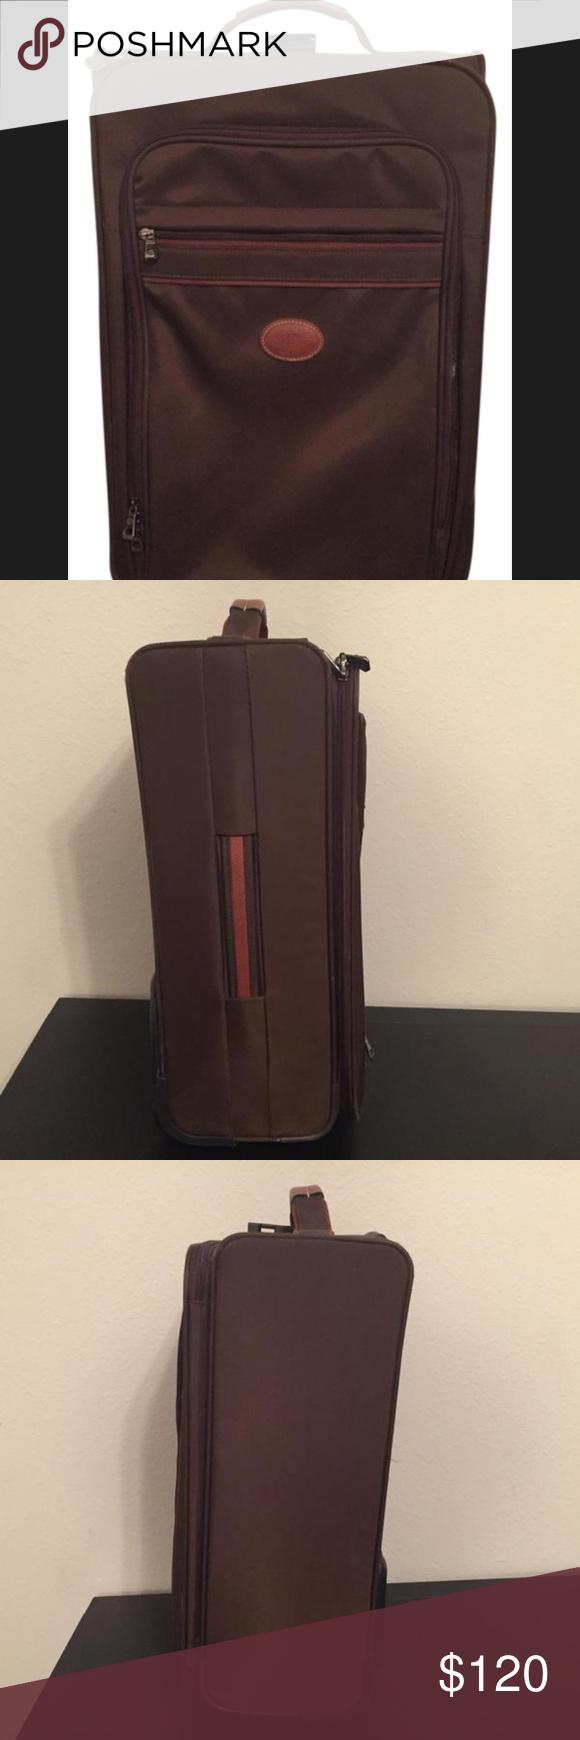 Longchamp Travel Bag Boxford   . Joe Greenaway 72ec522c6f